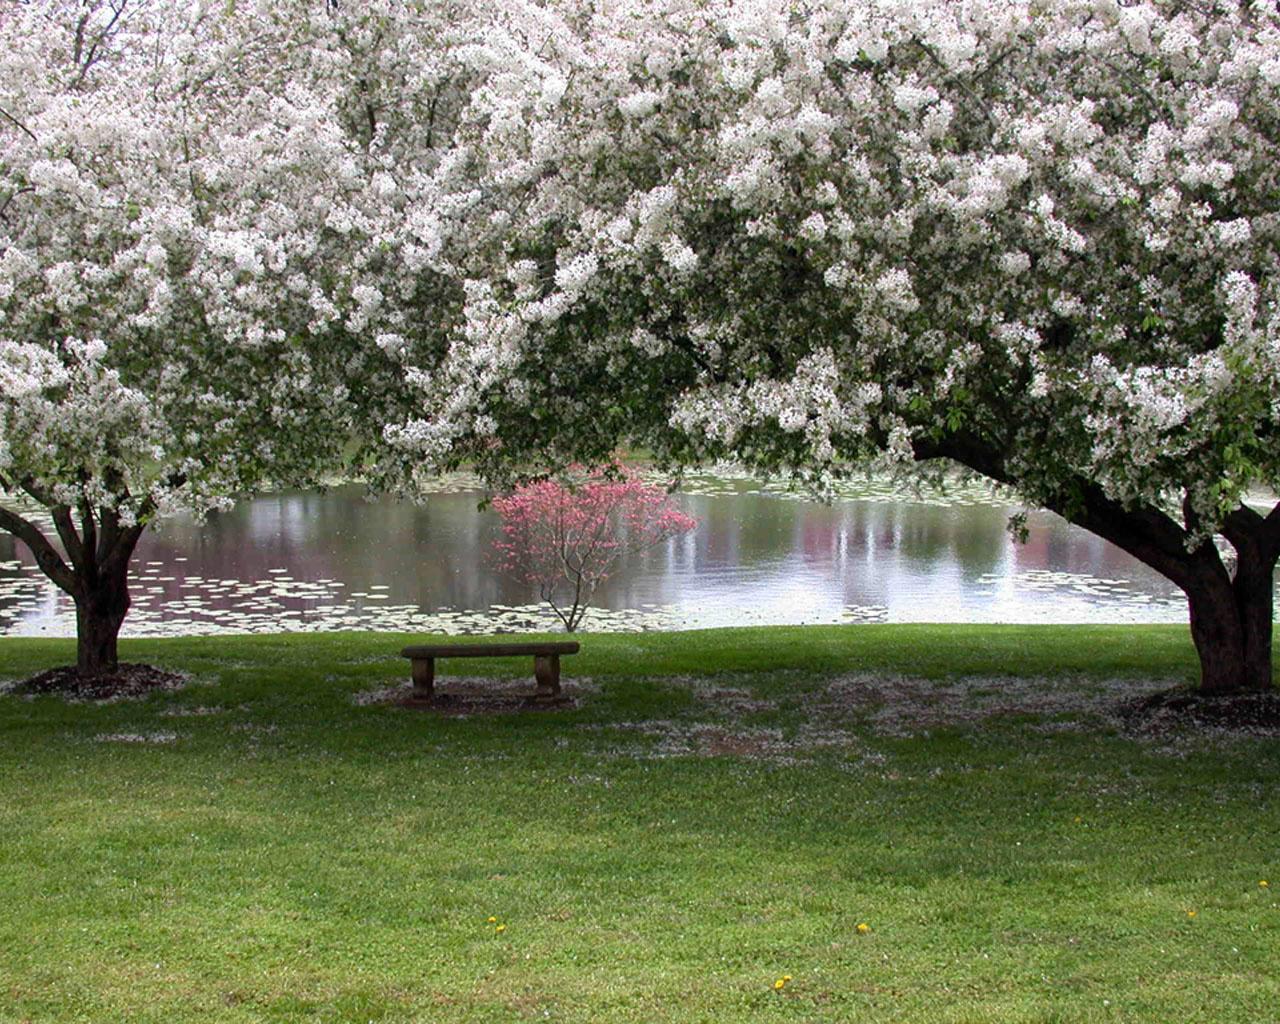 Природа пейзаж весна лавочка сад